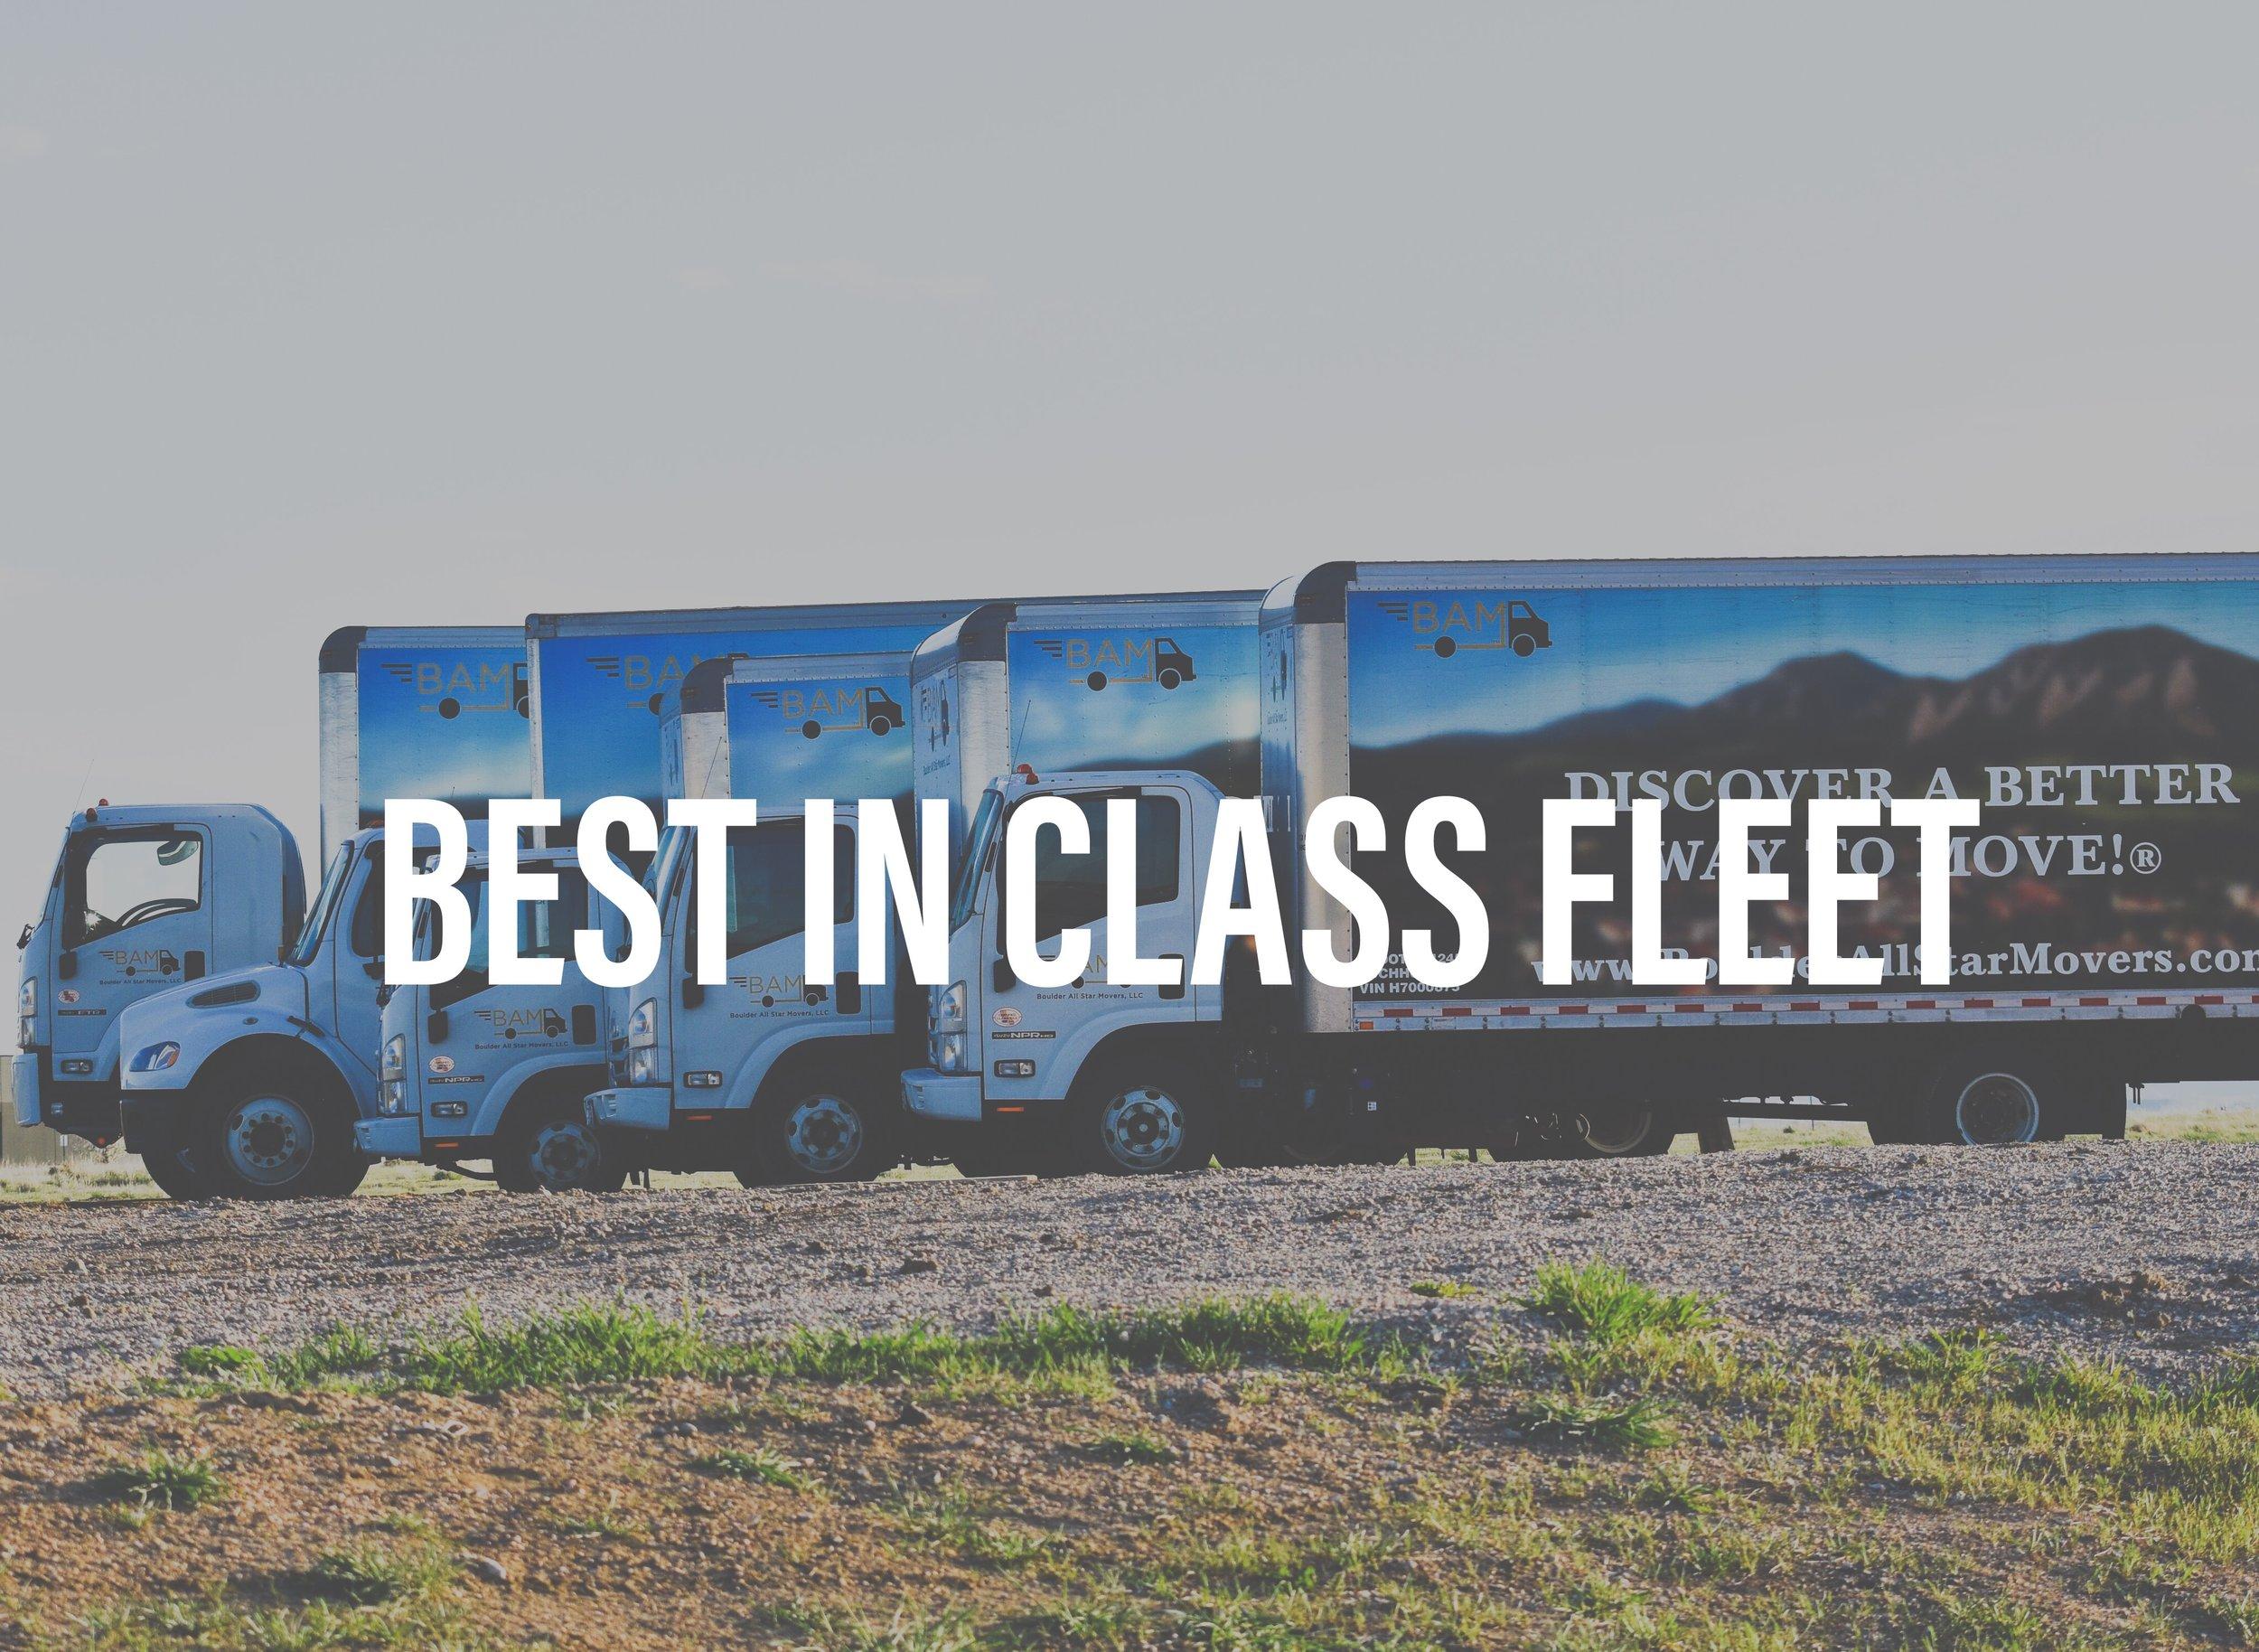 Best In Class Fleet .JPEG